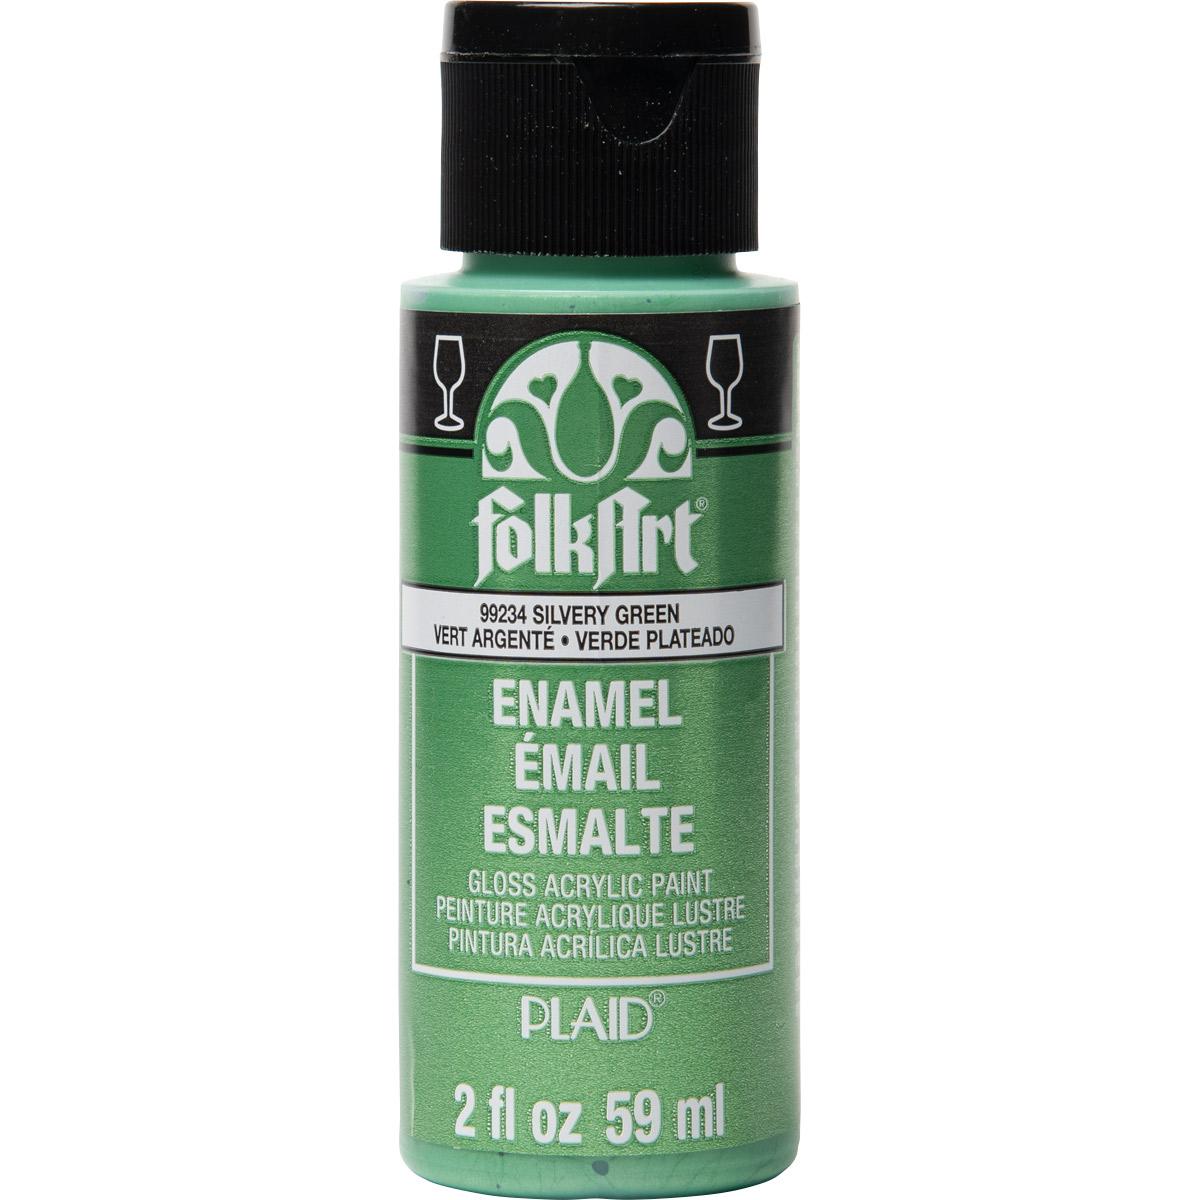 FolkArt ® Enamels™ - Metallic Silvery Green, 2 oz. - 99234